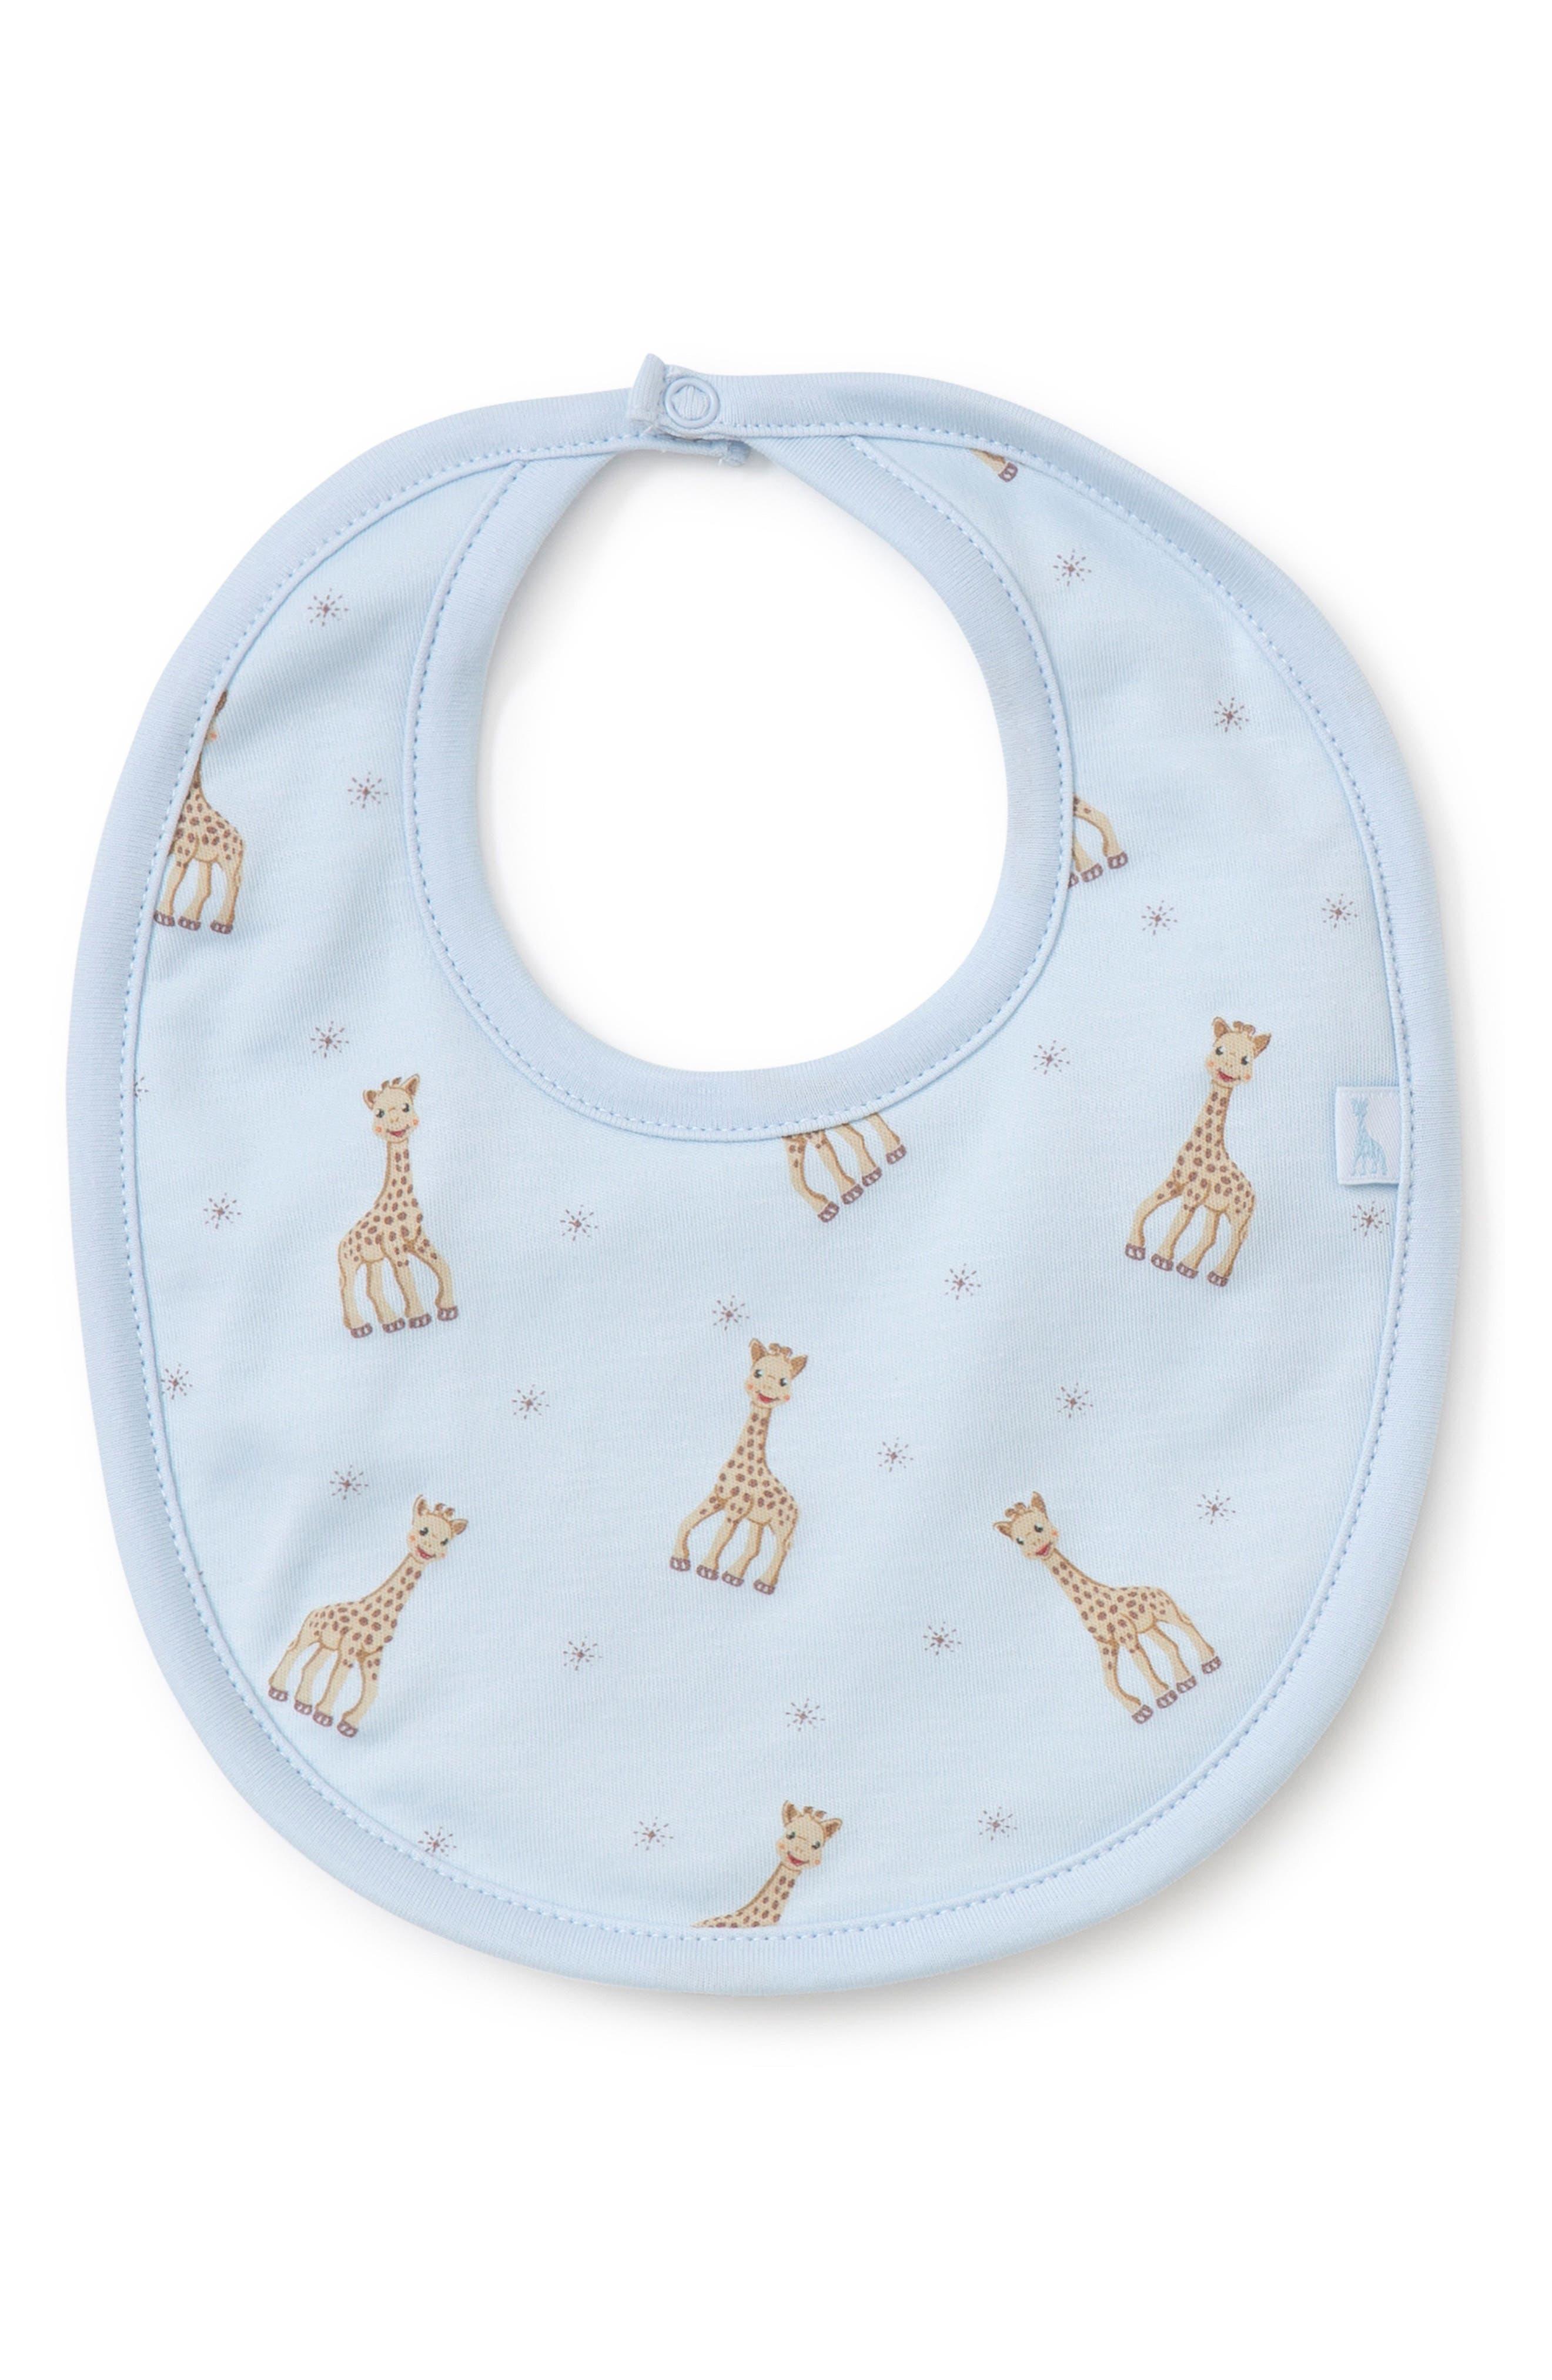 Infant Kissy Kissy X Sophie La Girafe Bib Size One Size  Blue